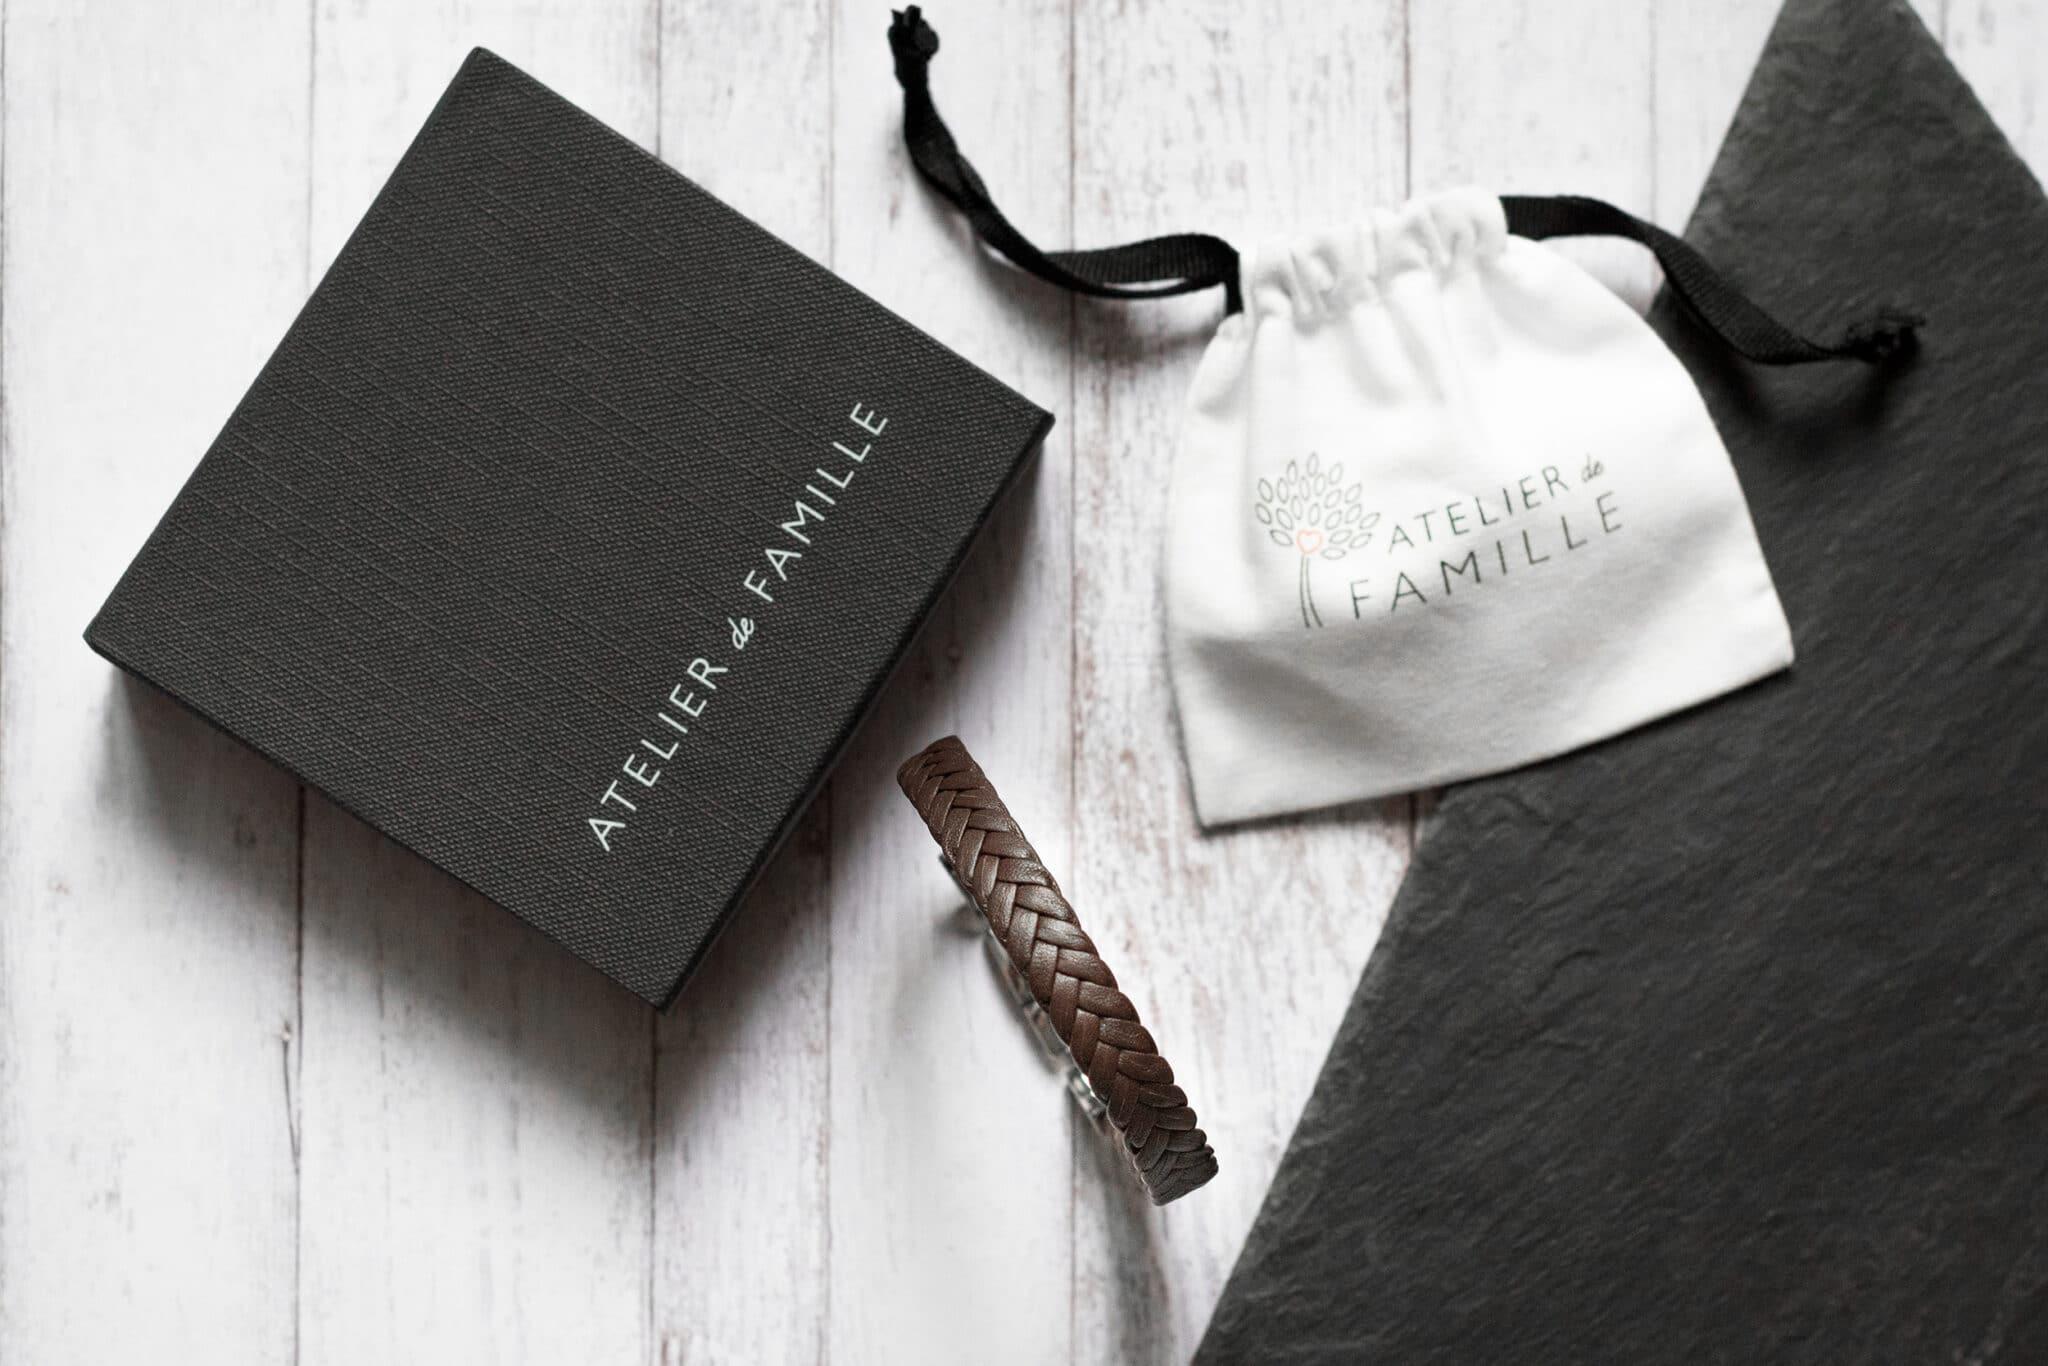 Visuel Atelier de Famille packaging #2